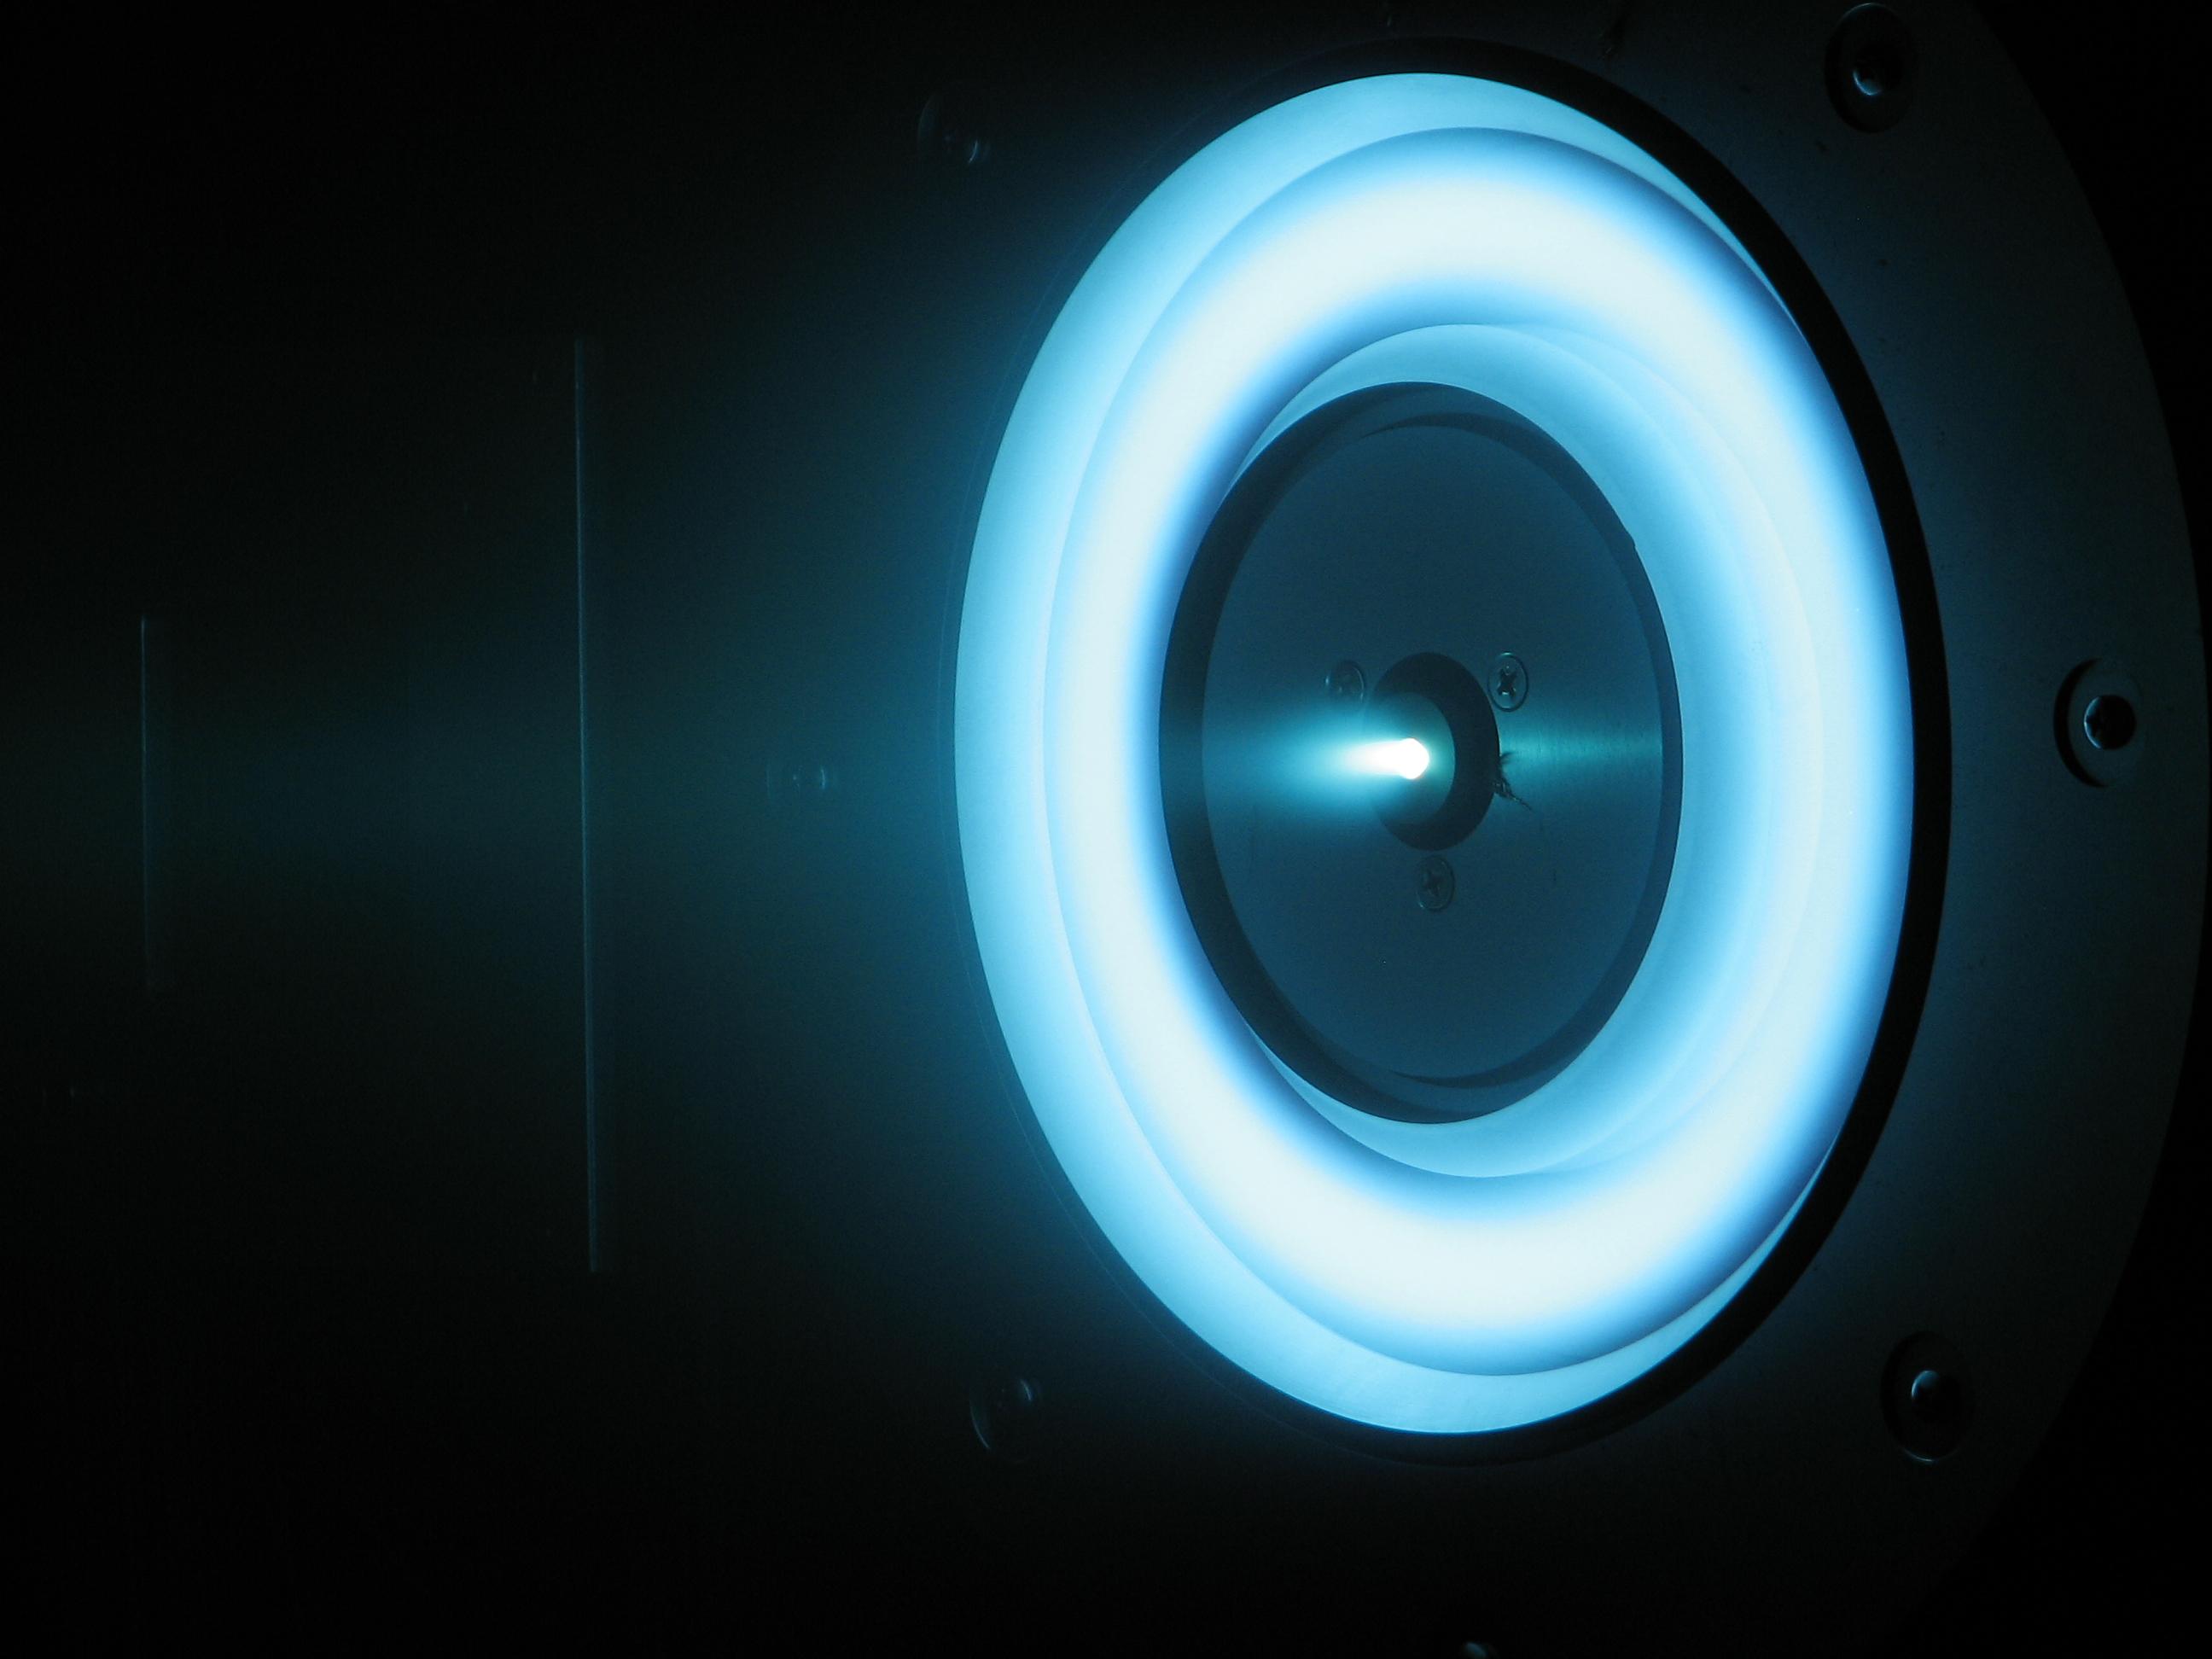 The Engine Burns Blue | NASA